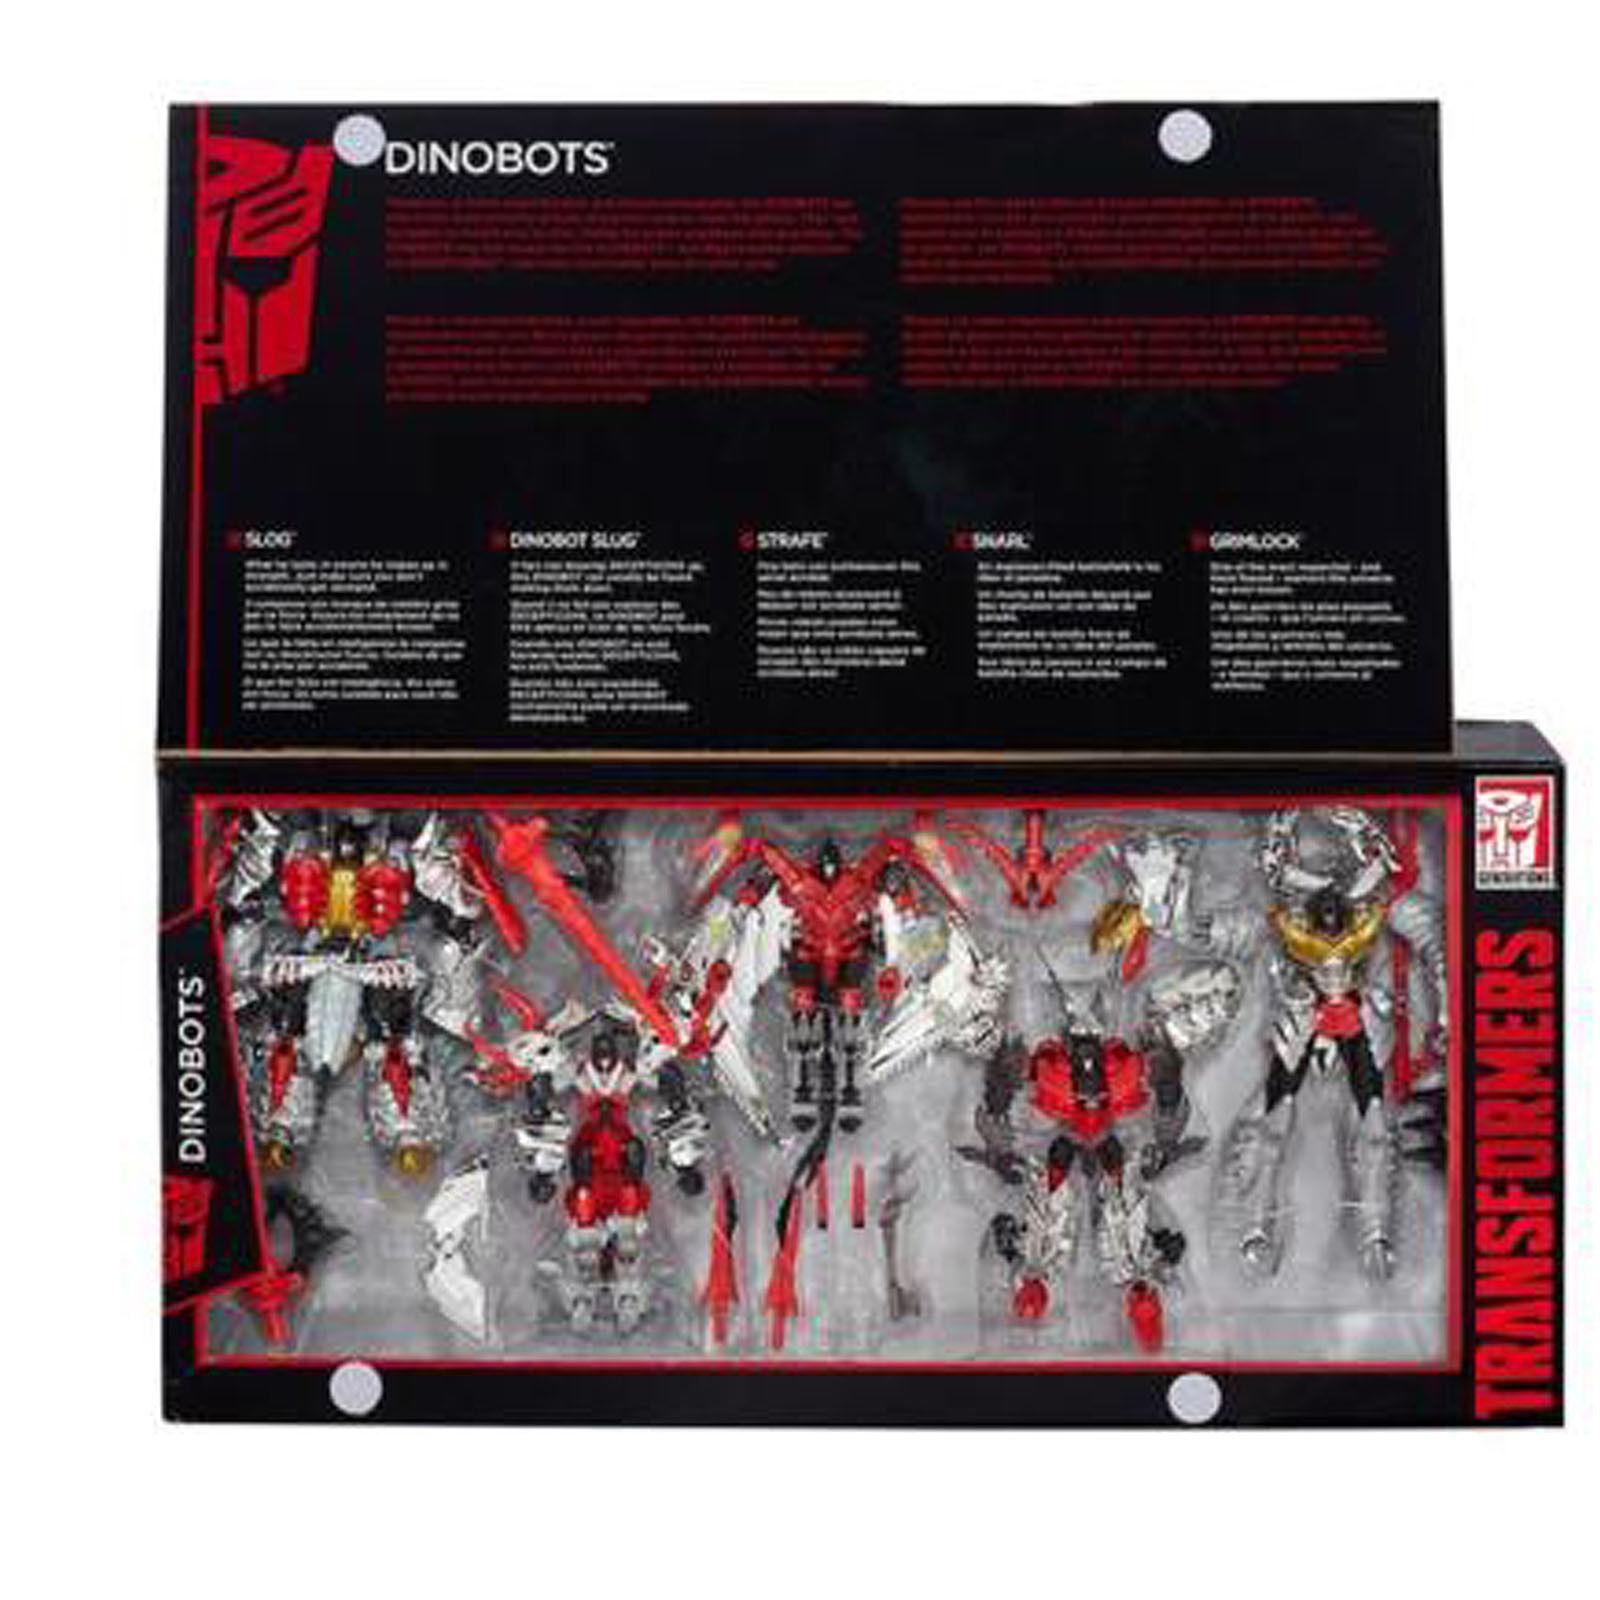 Transformers Age of Extinction Platinum Edition DINOBOTS DINOBOTS DINOBOTS Action Figure Toy Gift 35bfbb